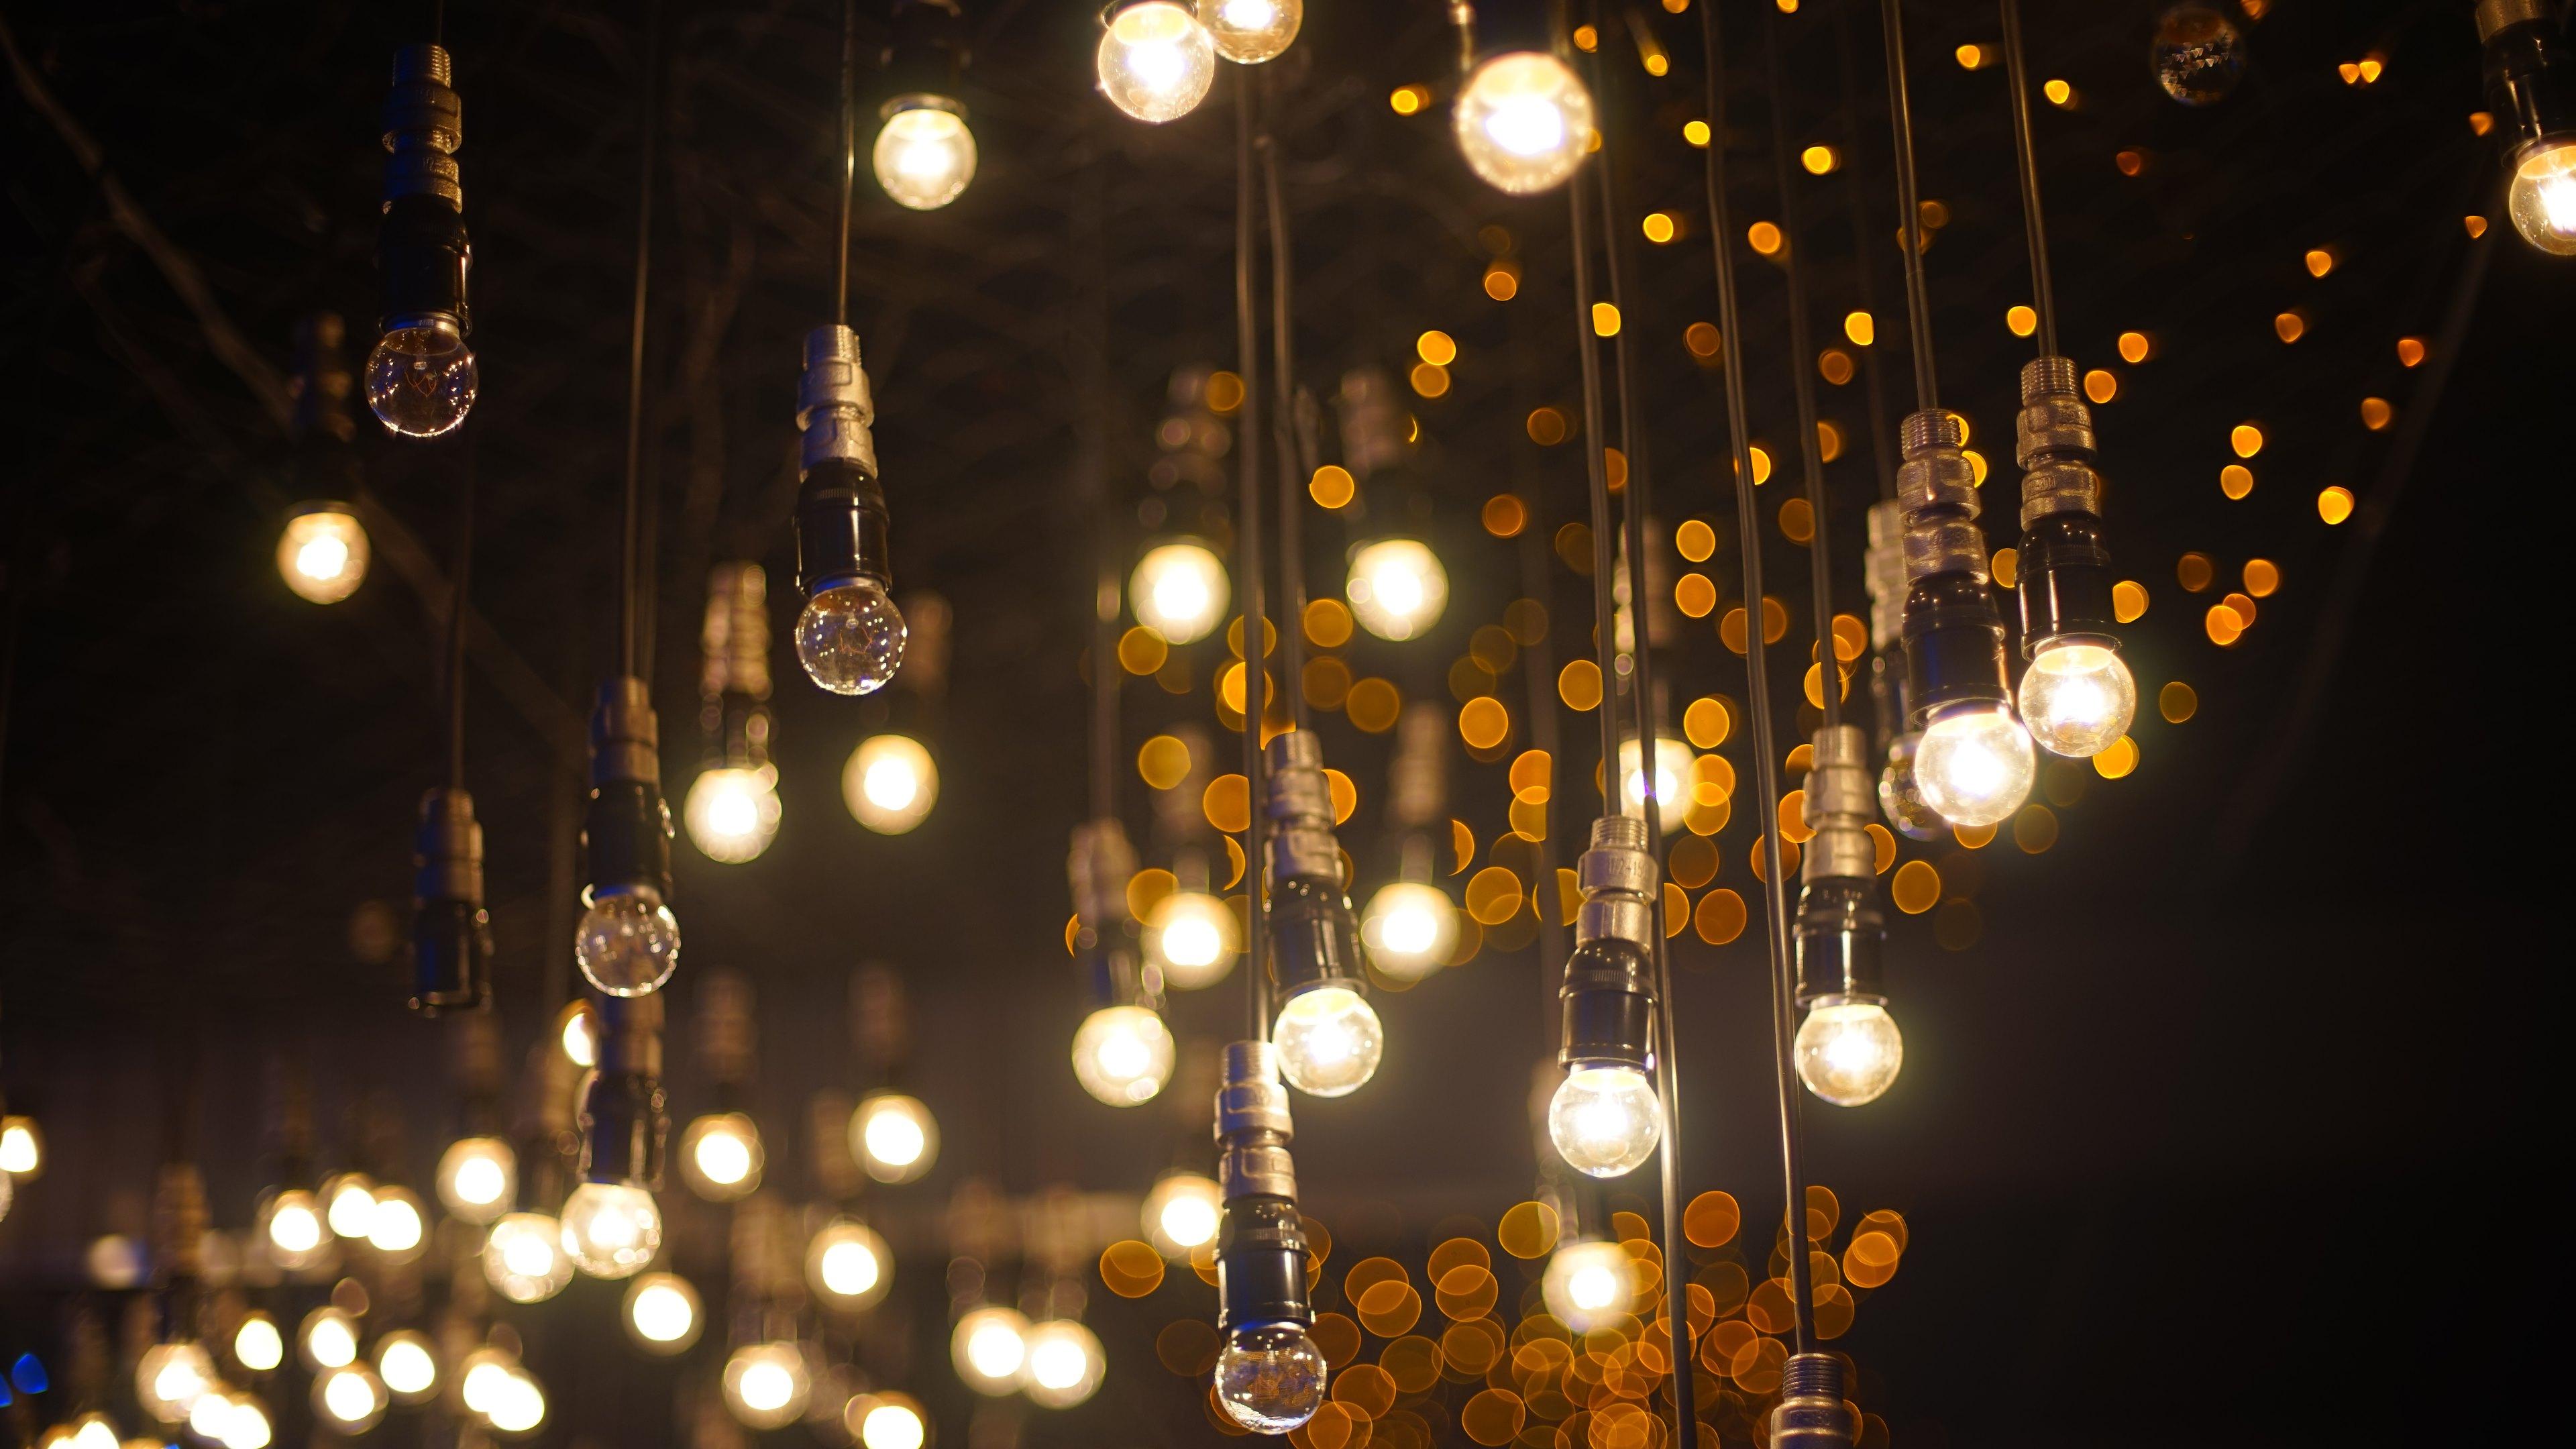 Light Bulb Wallpaper HD